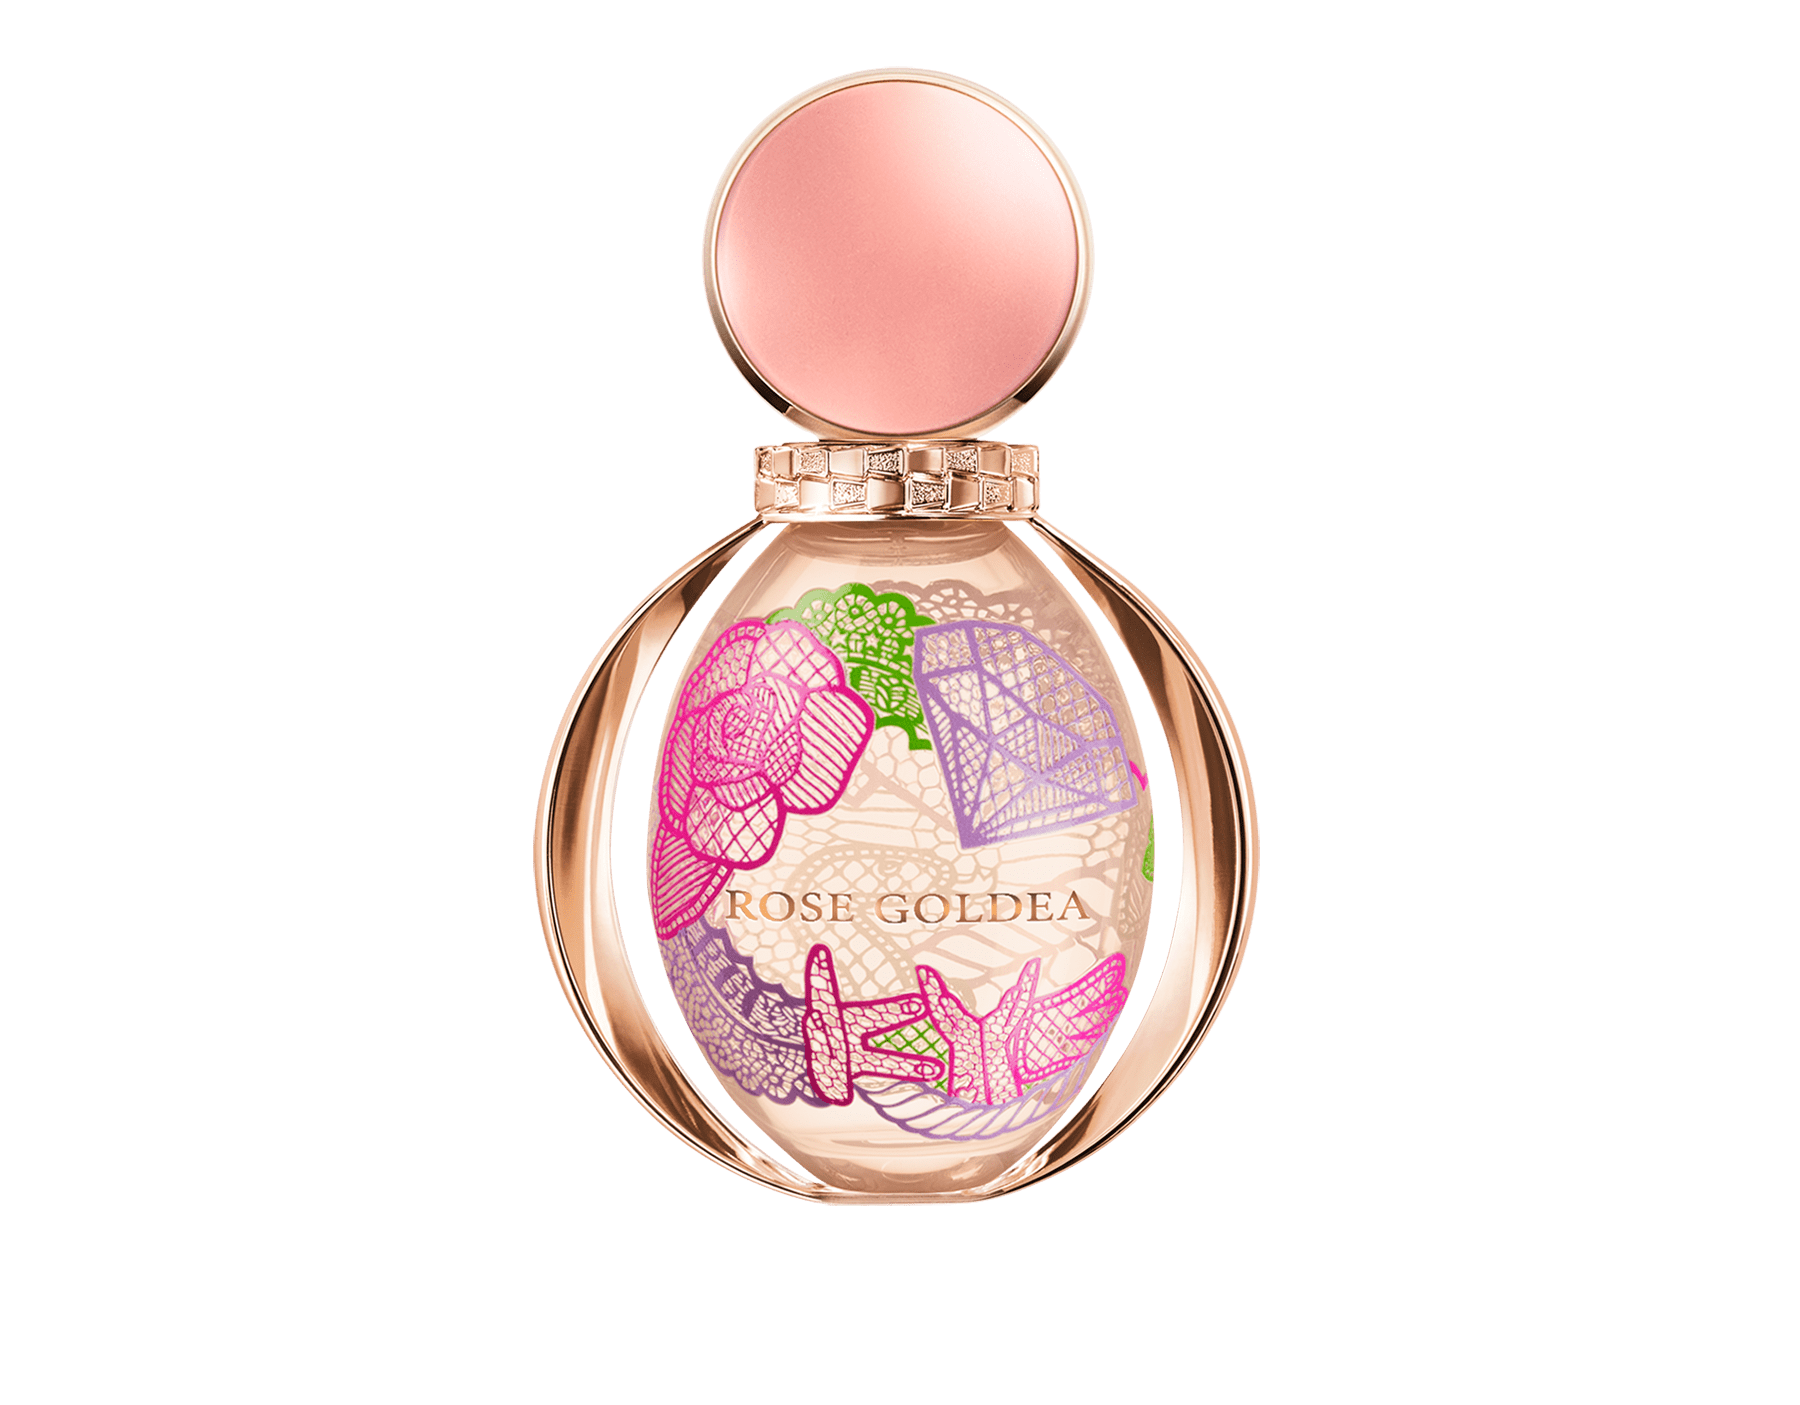 A new Limited Edition in collaboration with a Korean artist, Kathleen Kye, encapsulating the original Rose Goldea Eau de Parfum. 41150 image 1